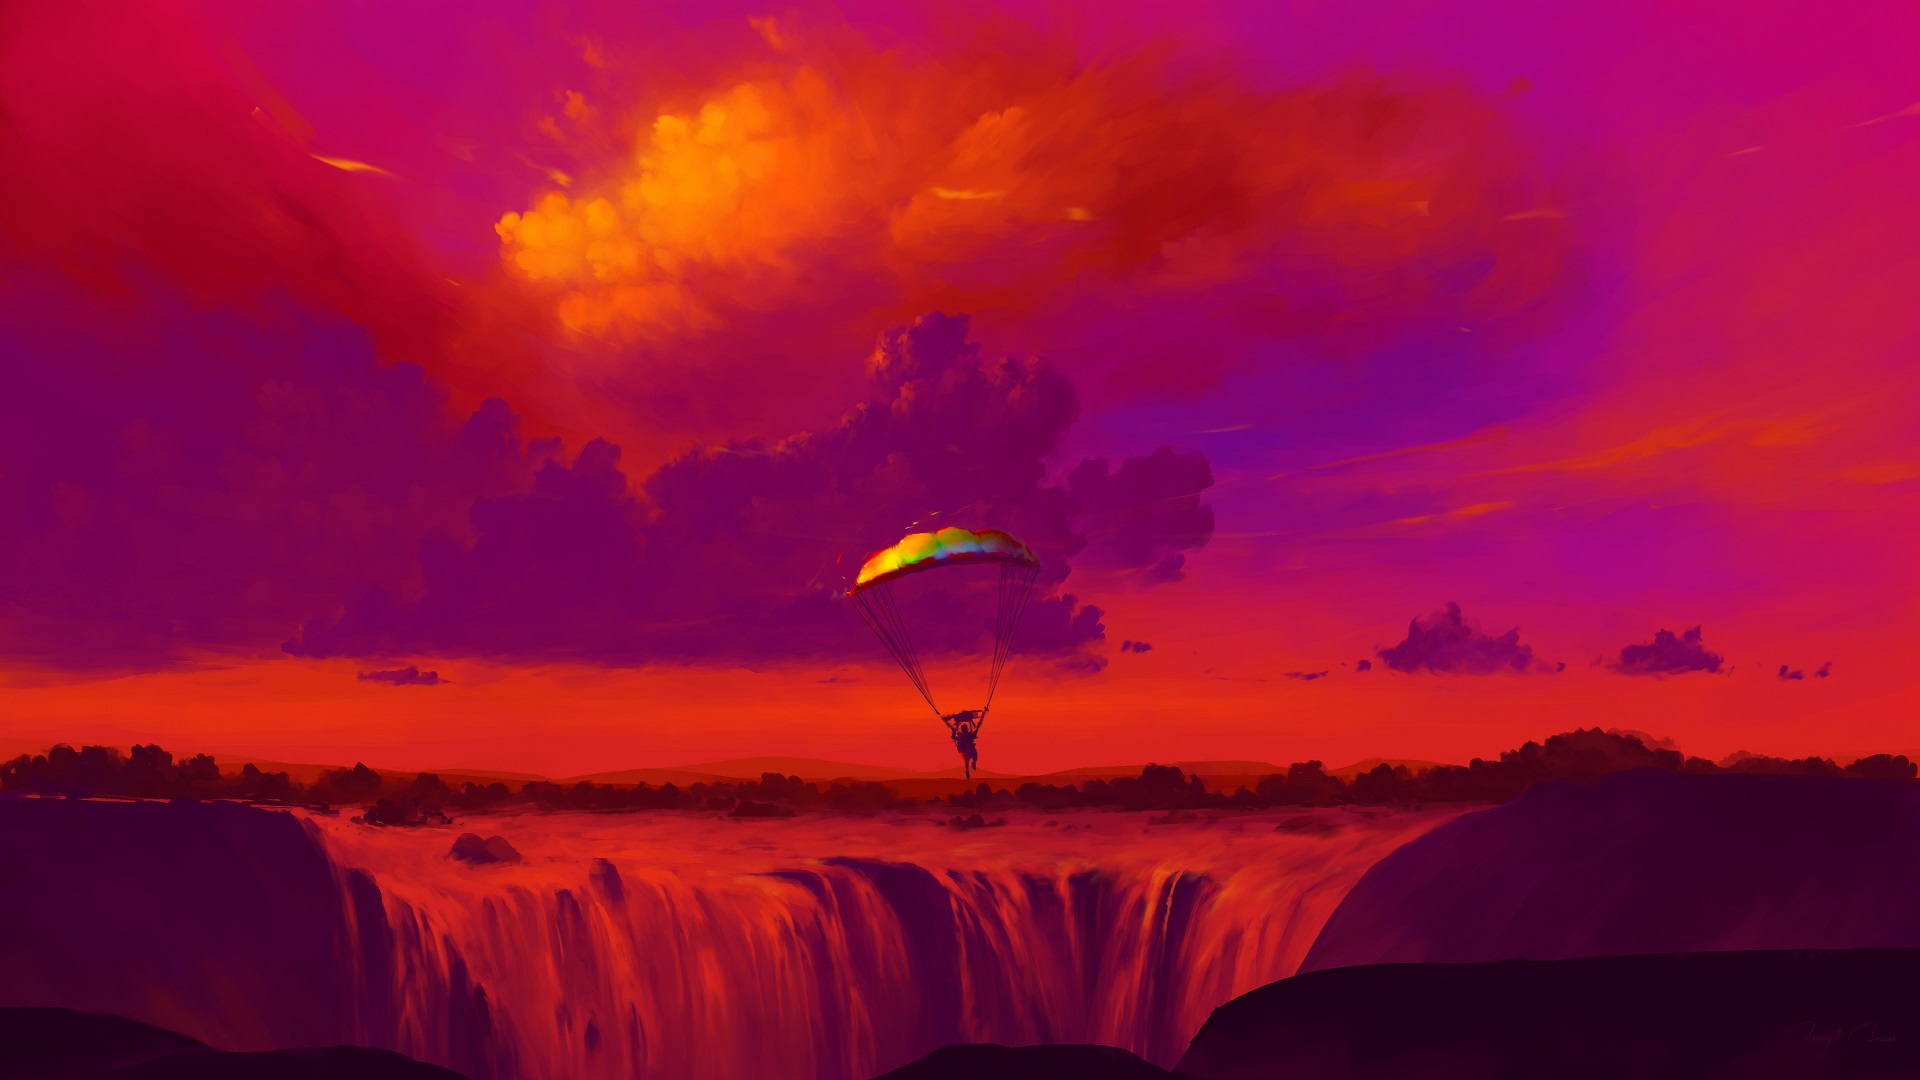 General 1920x1080 BisBiswas digital art parachutes waterfall nature clouds